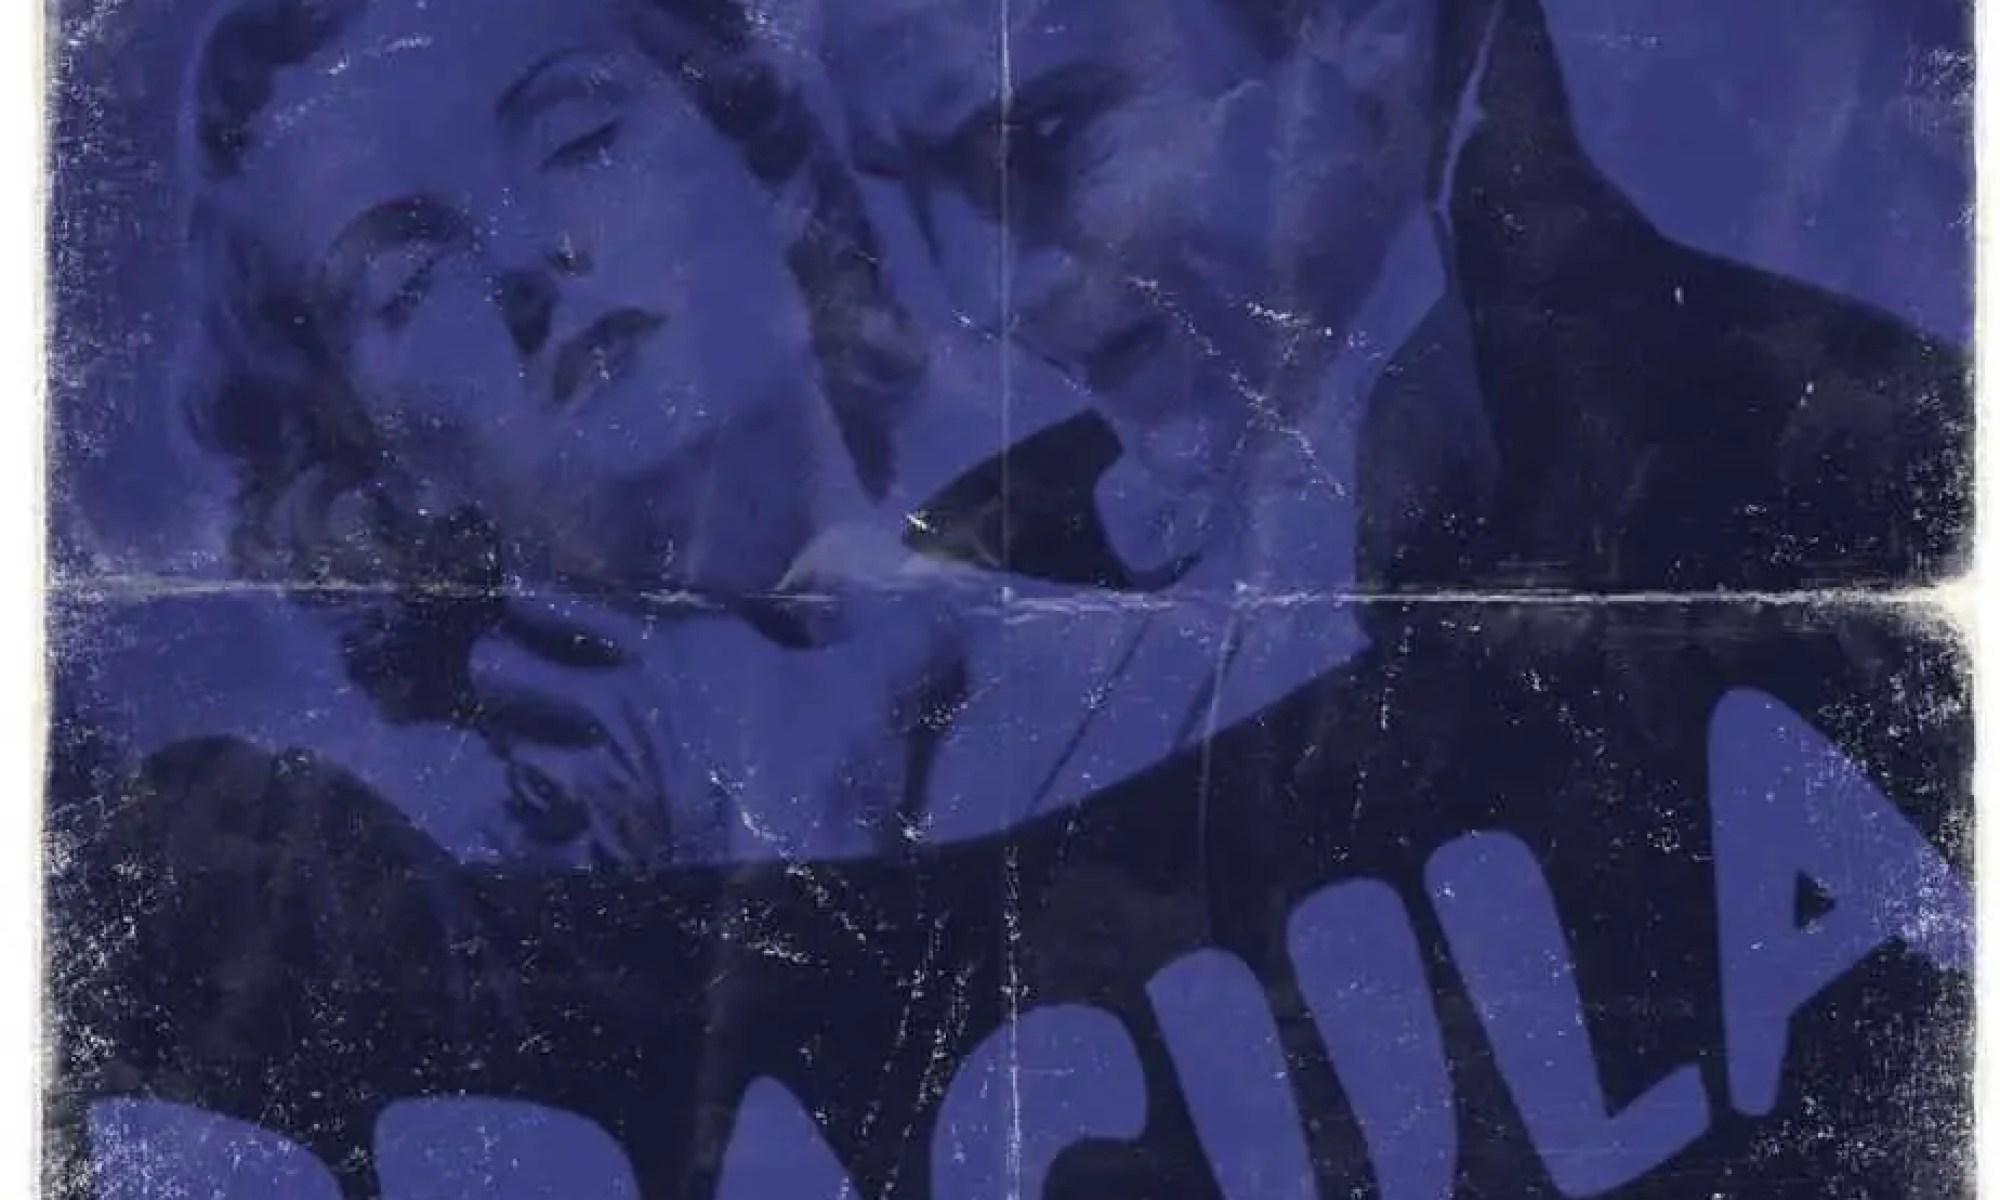 dracula horror poster